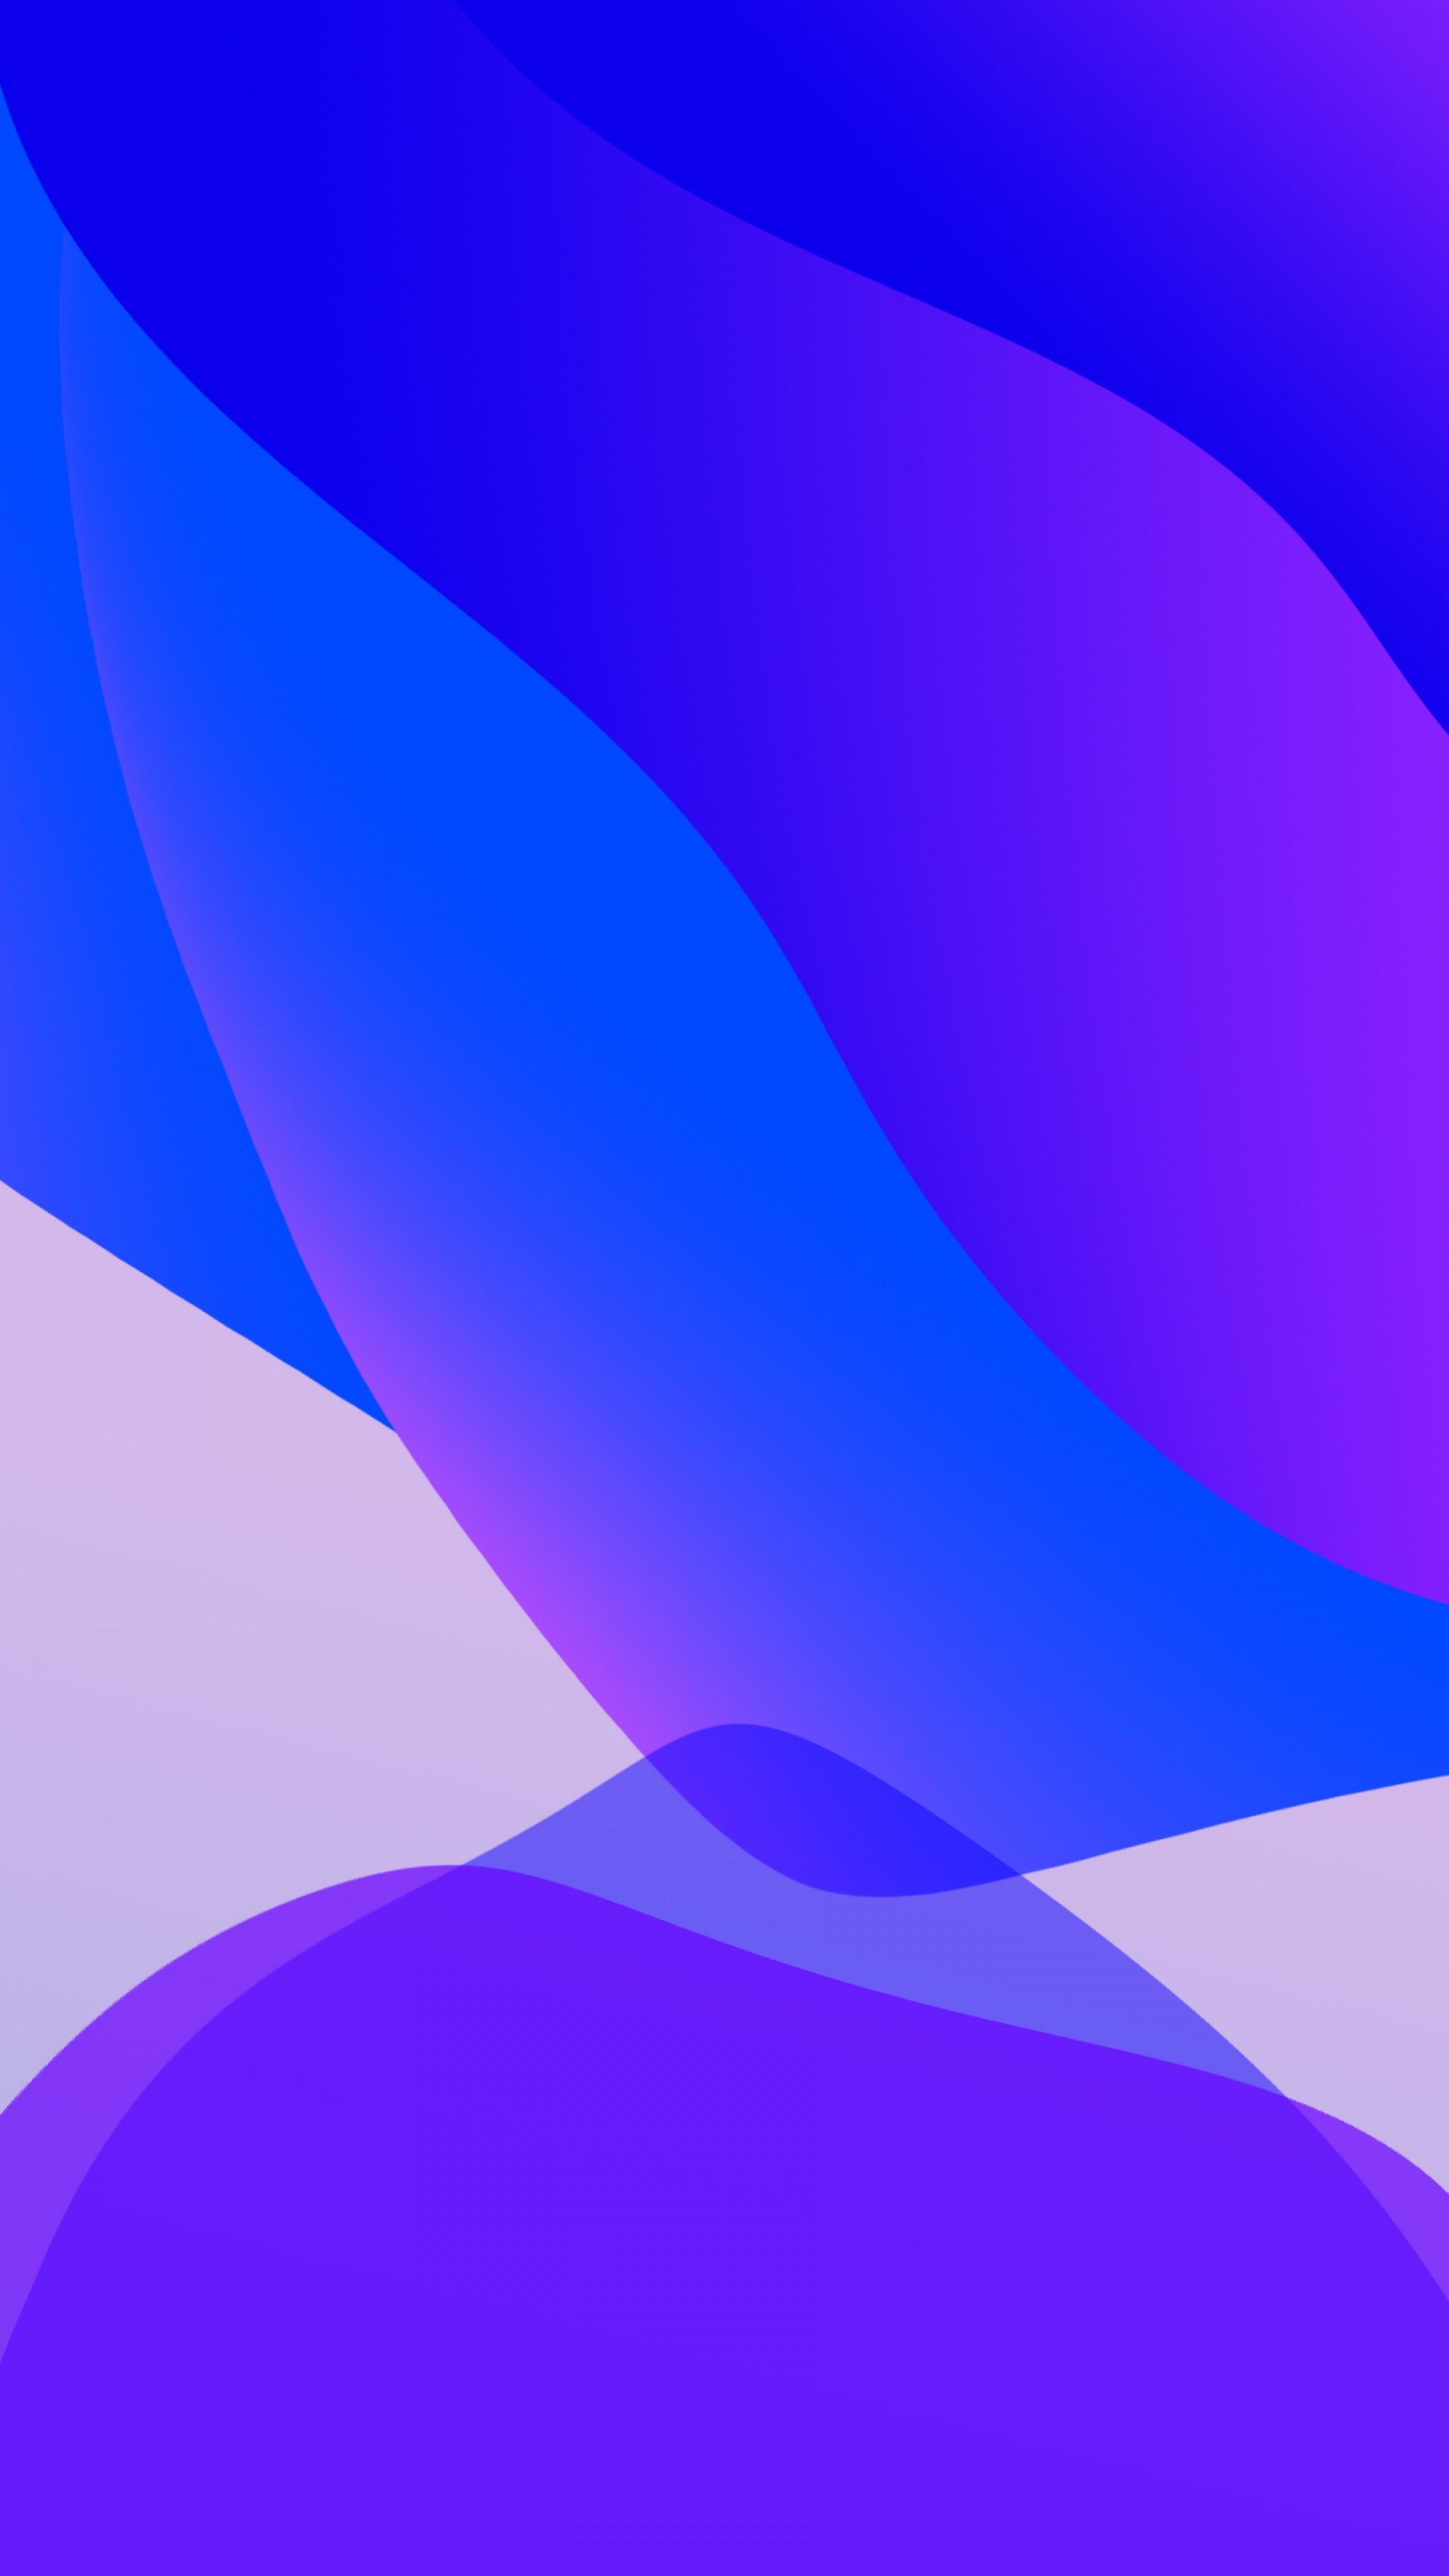 ios 13 2160x3840 ipados abstract apple september 2019 event 4k 22127